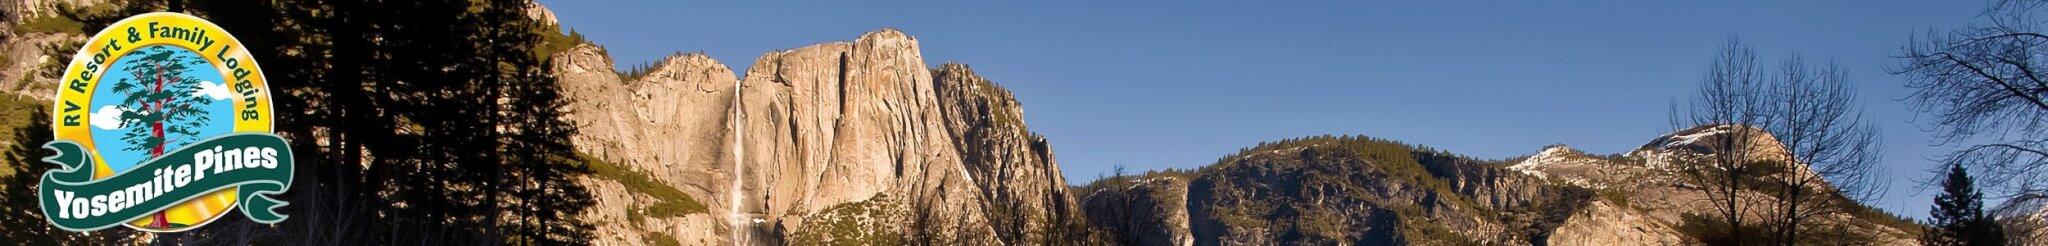 Yosemite Pines RV & Camping